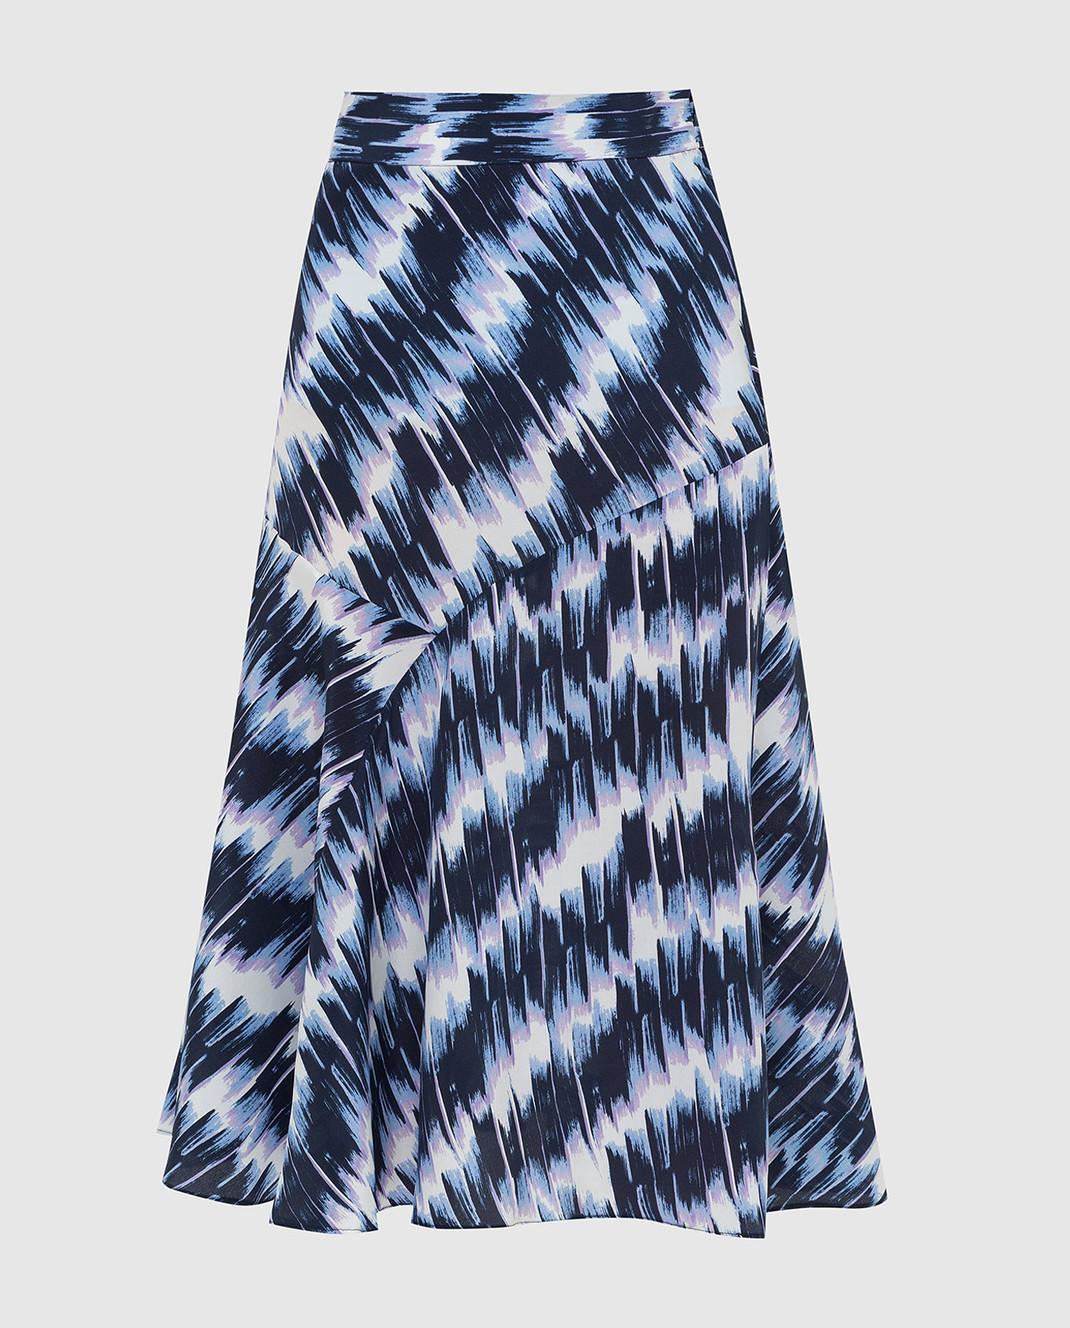 Max Mara Sportmax Темно-синяя юбка из шелка FALENA